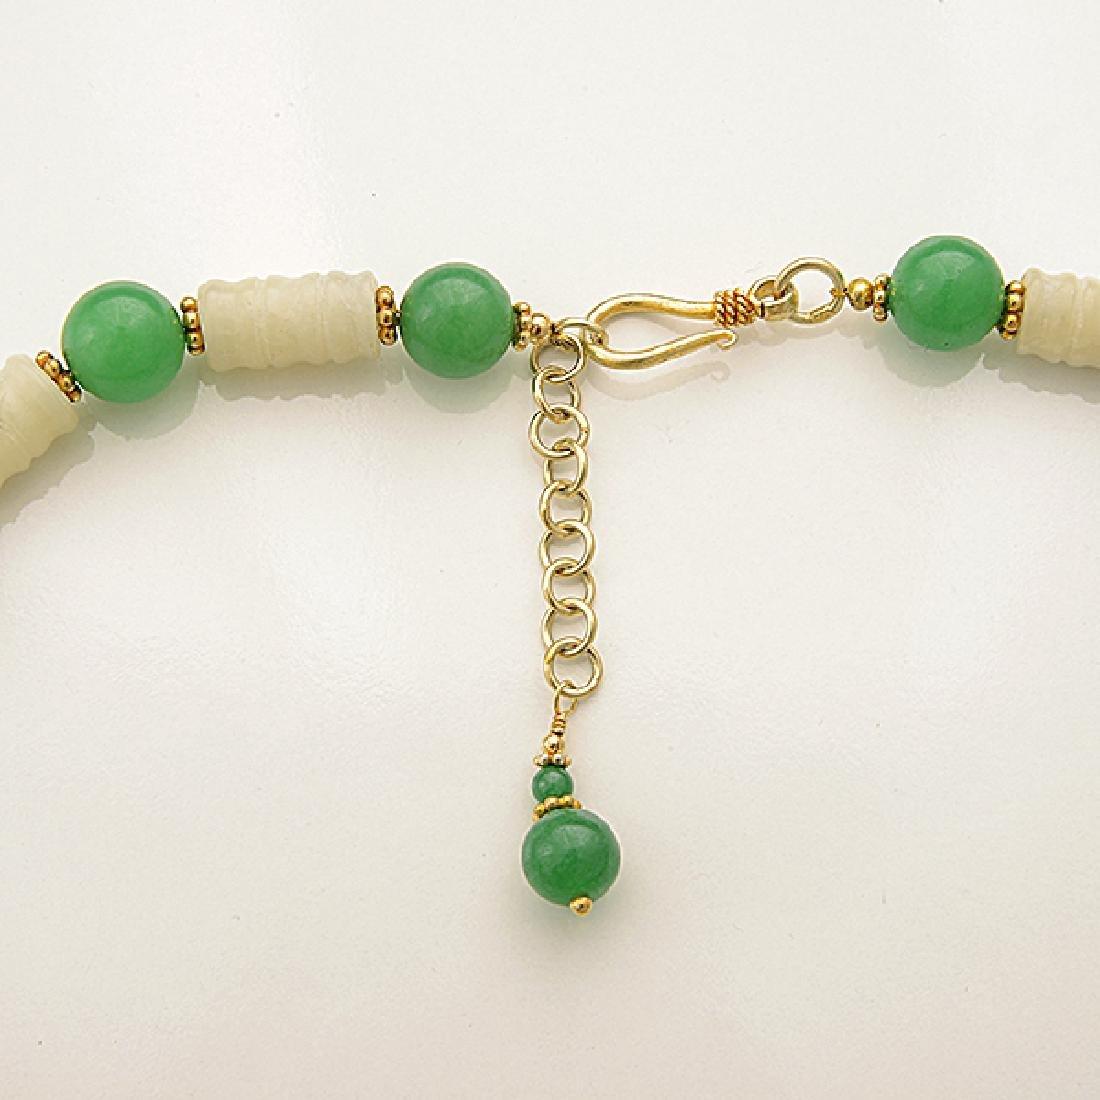 Jade, Quench Crackled Quartz, Vermeil Necklace. - 5